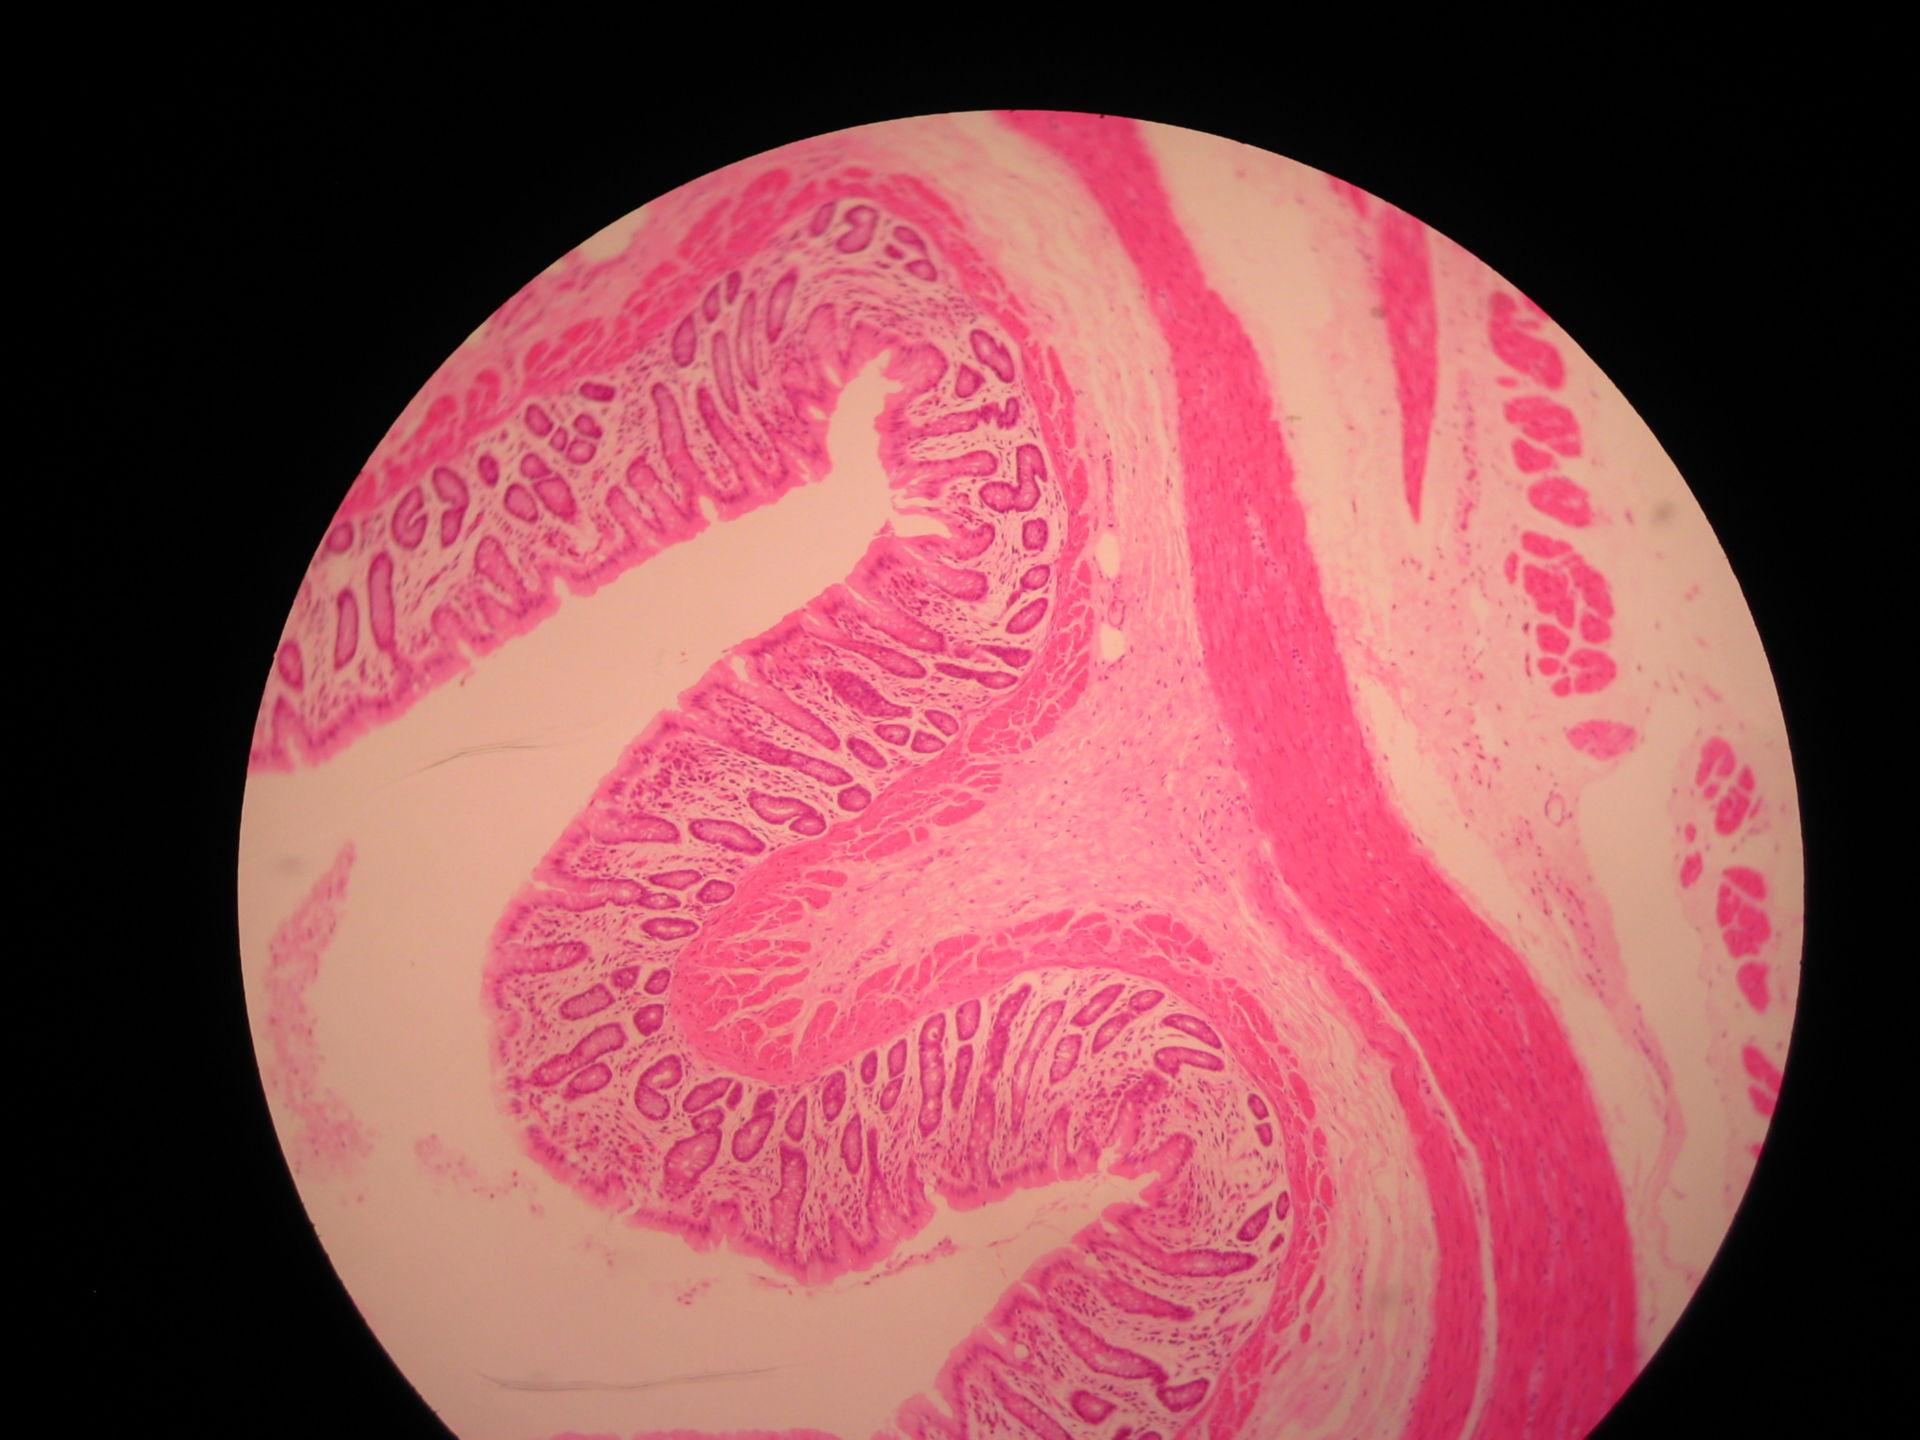 Veterinary medicine: Colon of a sheep- Layering